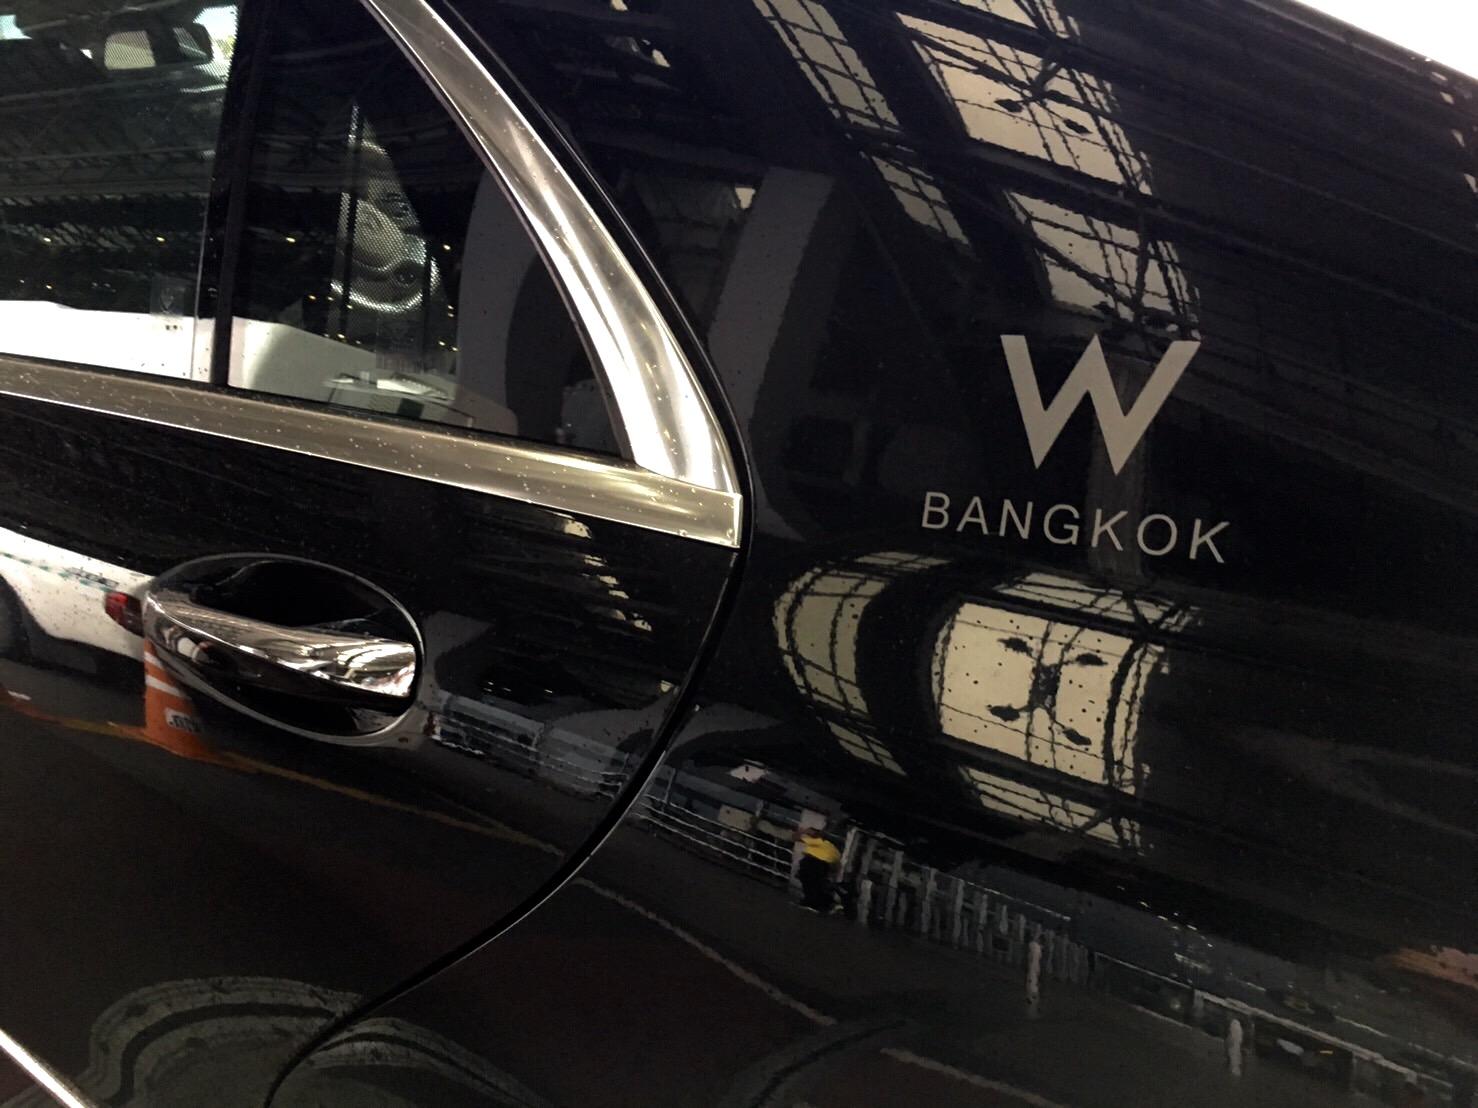 Wホテル-バンコク-リムジン-空港送迎-2